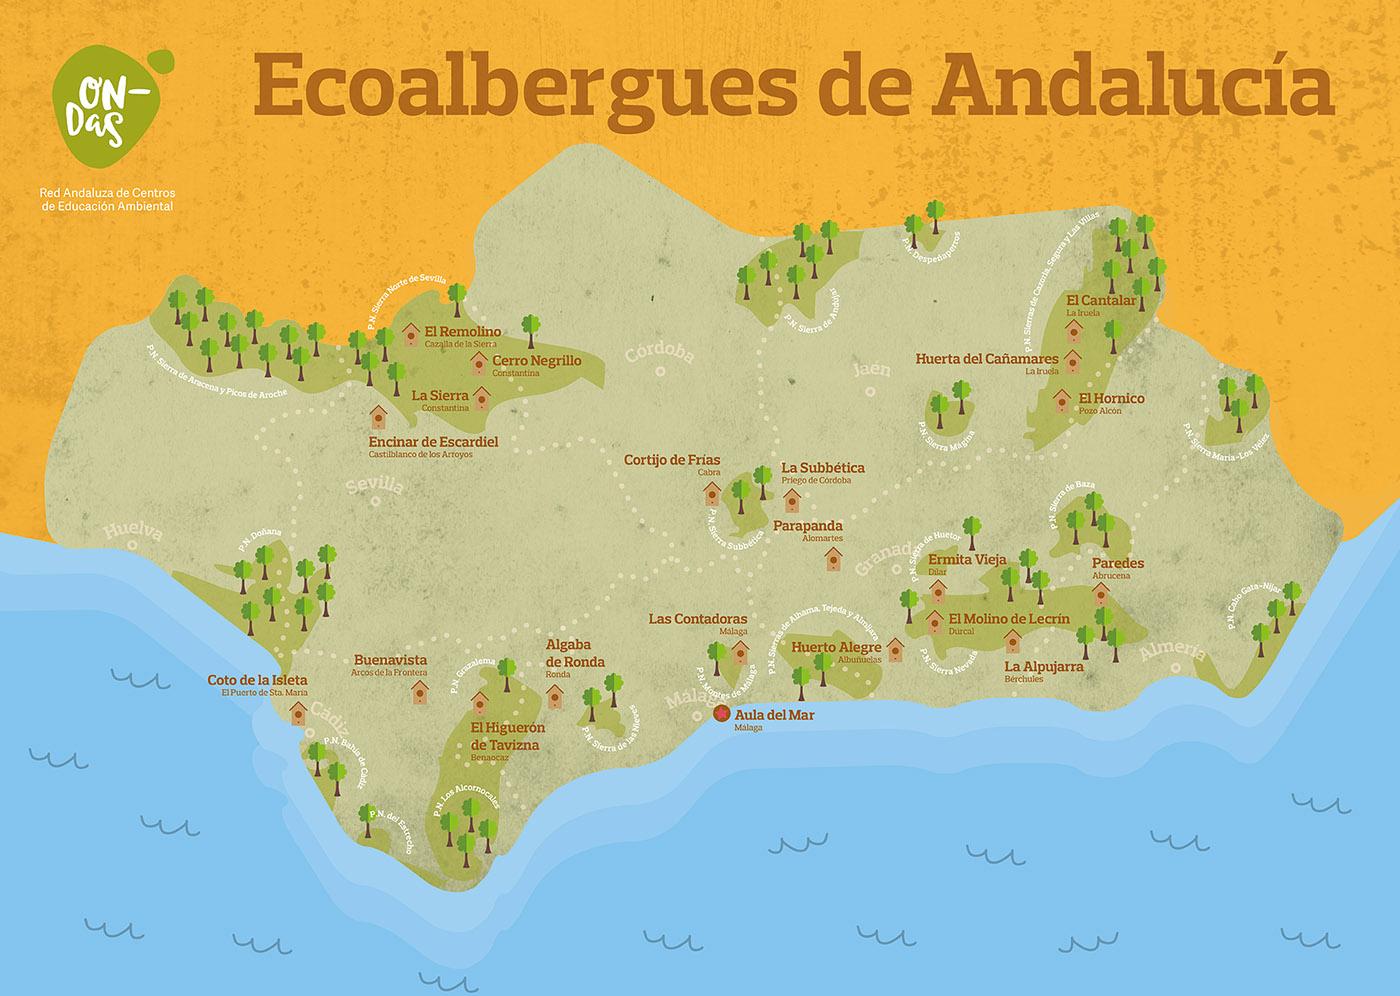 Mapa Eco Albergues de Andalucía